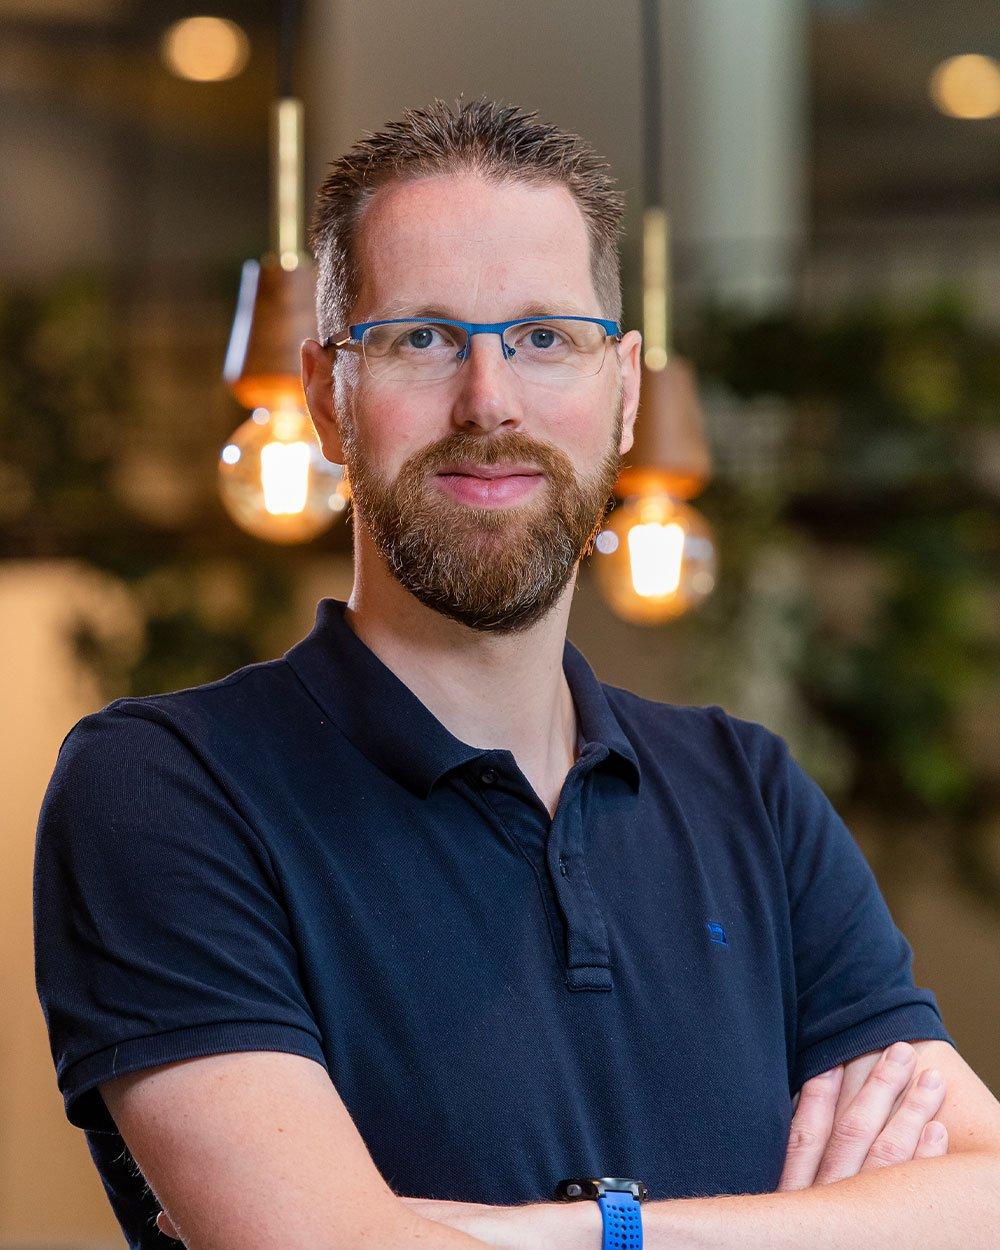 Niek Klein Gunnewiek, Teamlead Digital Marketing bij Bright